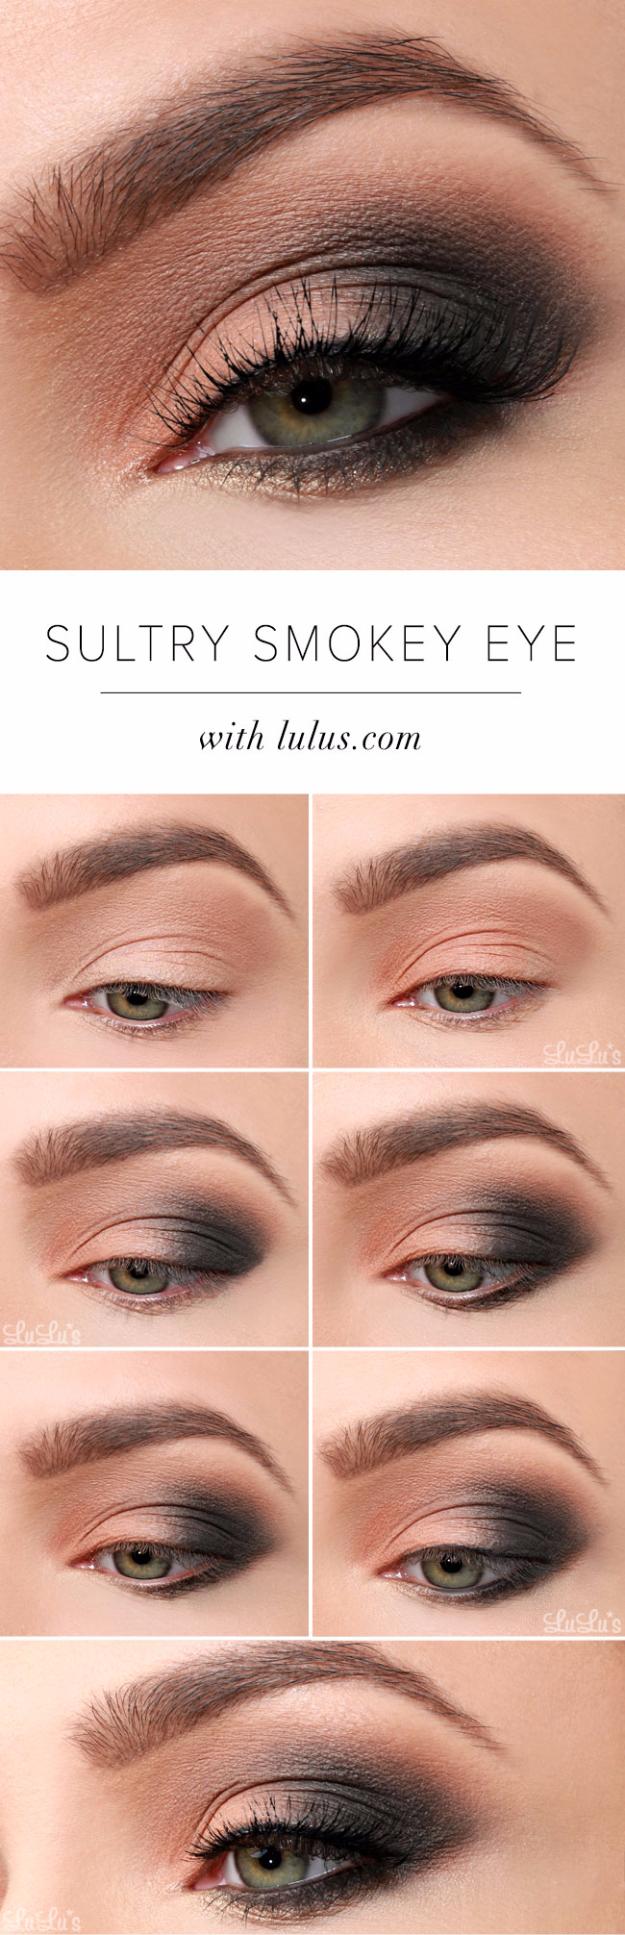 9 Cool Makeup Hacks